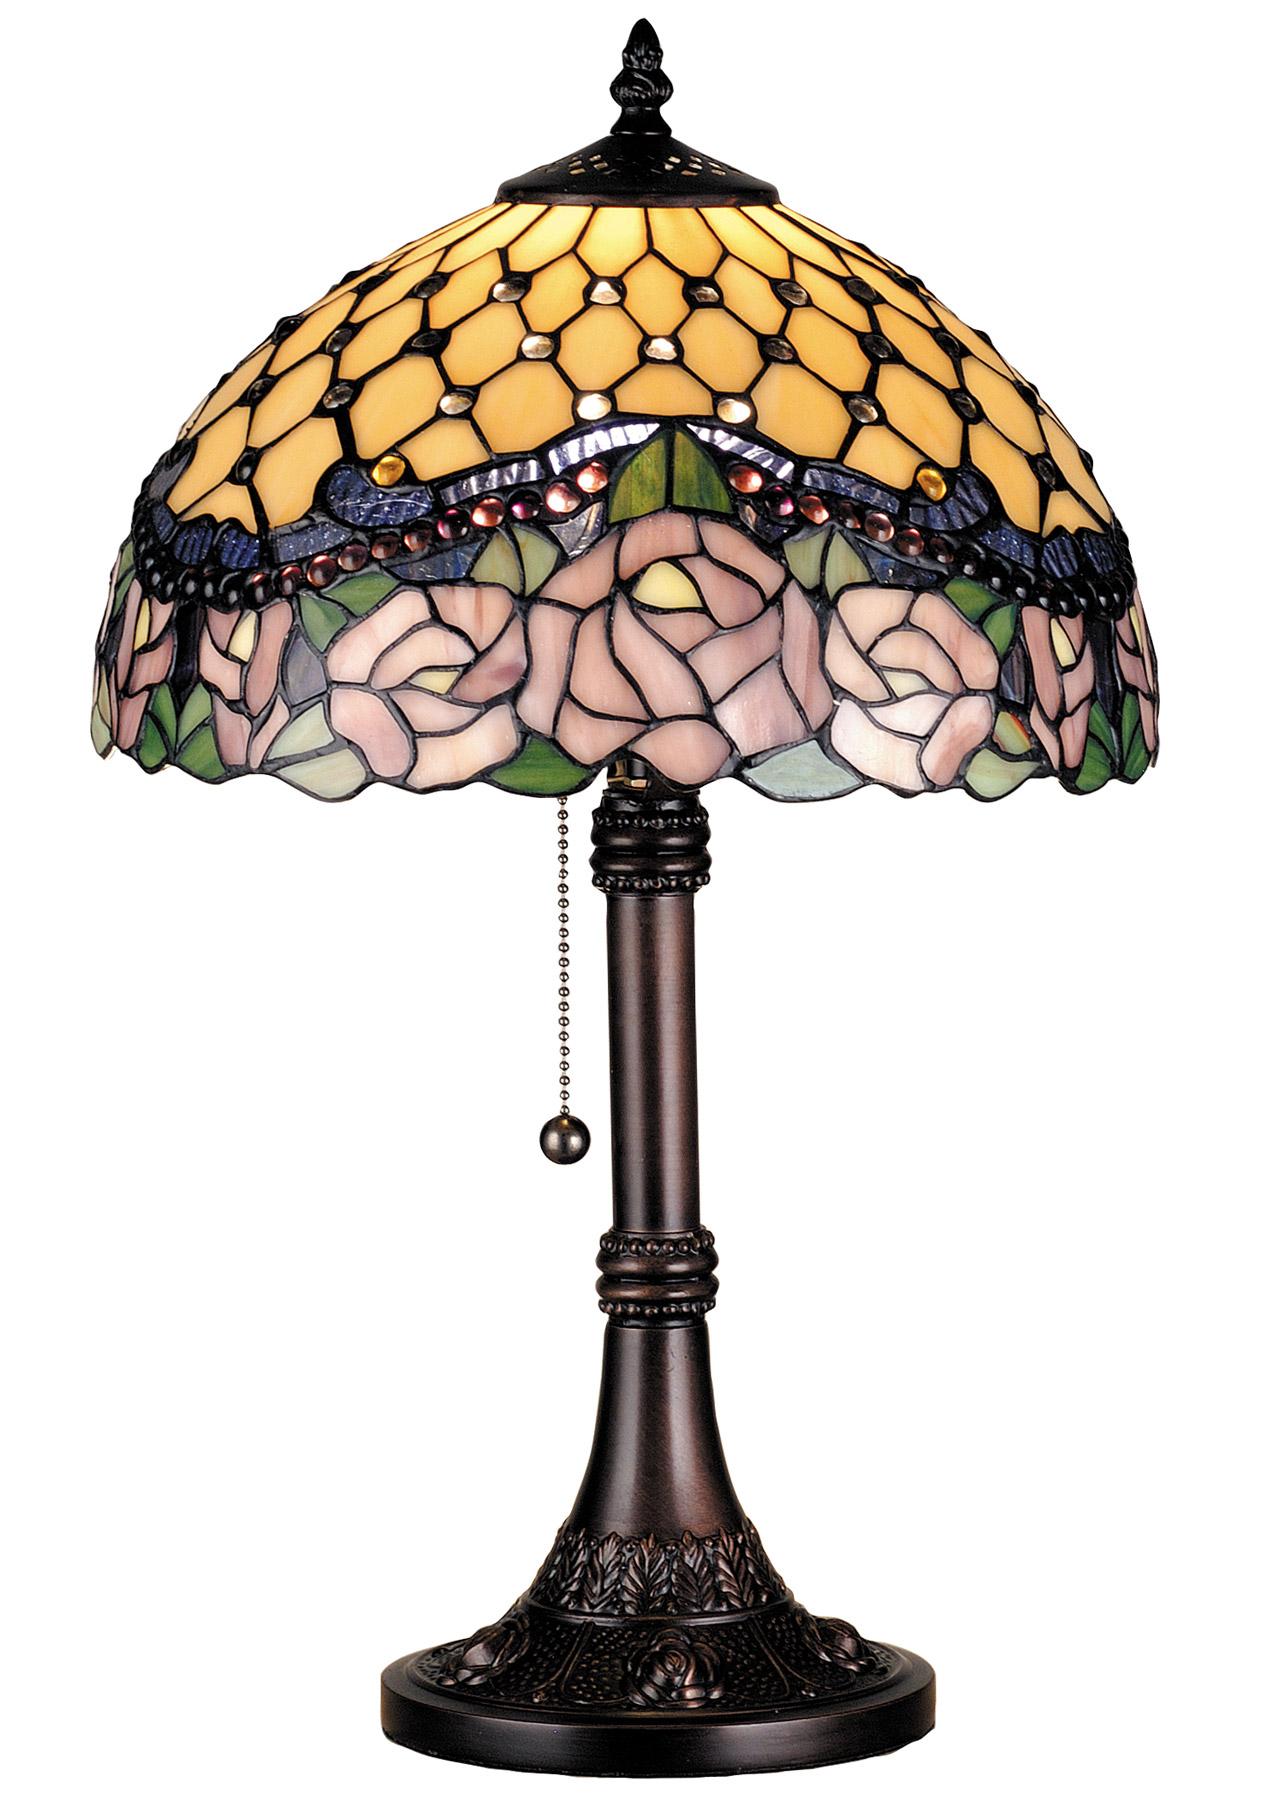 Meyda 82304 Tiffany Jeweled Rose Accent Lamp